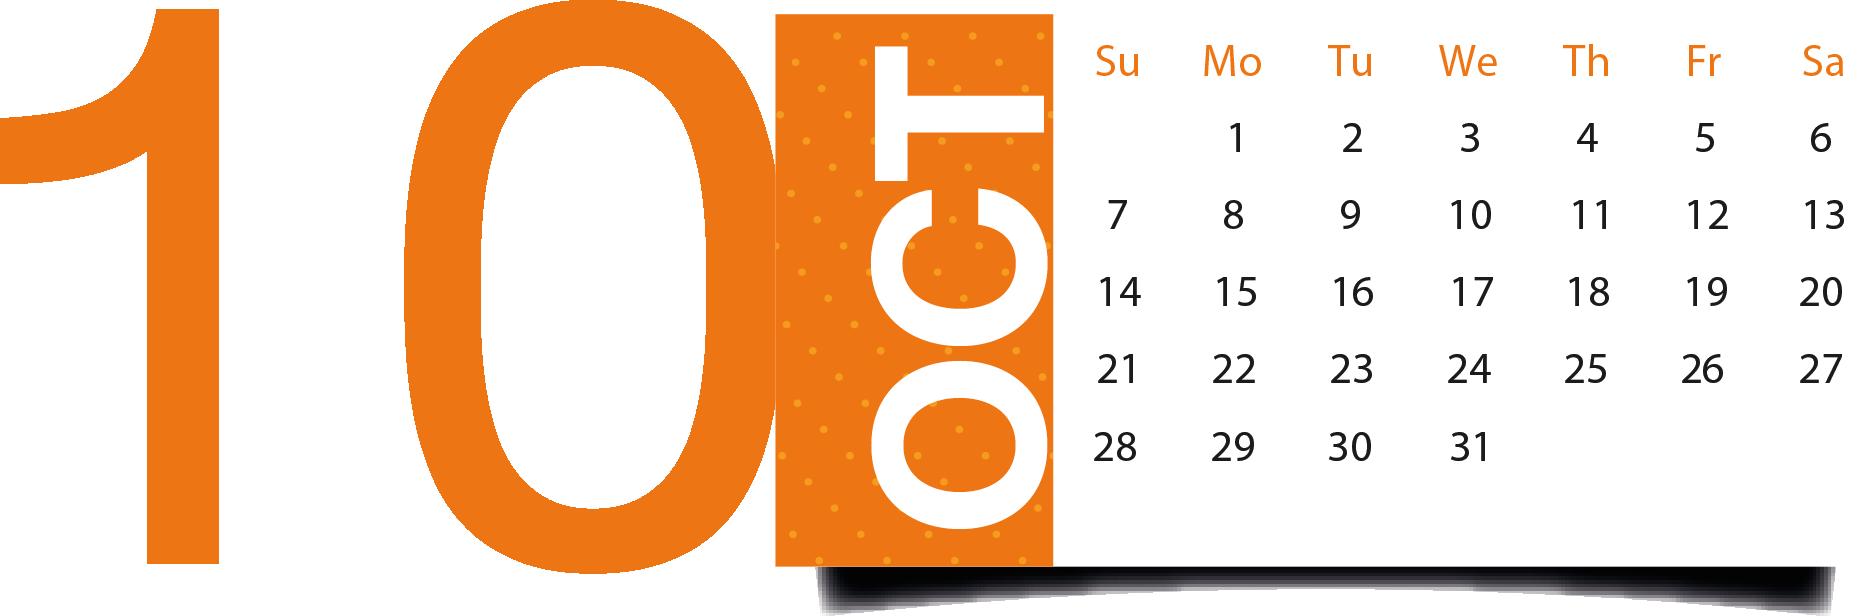 calendar-10